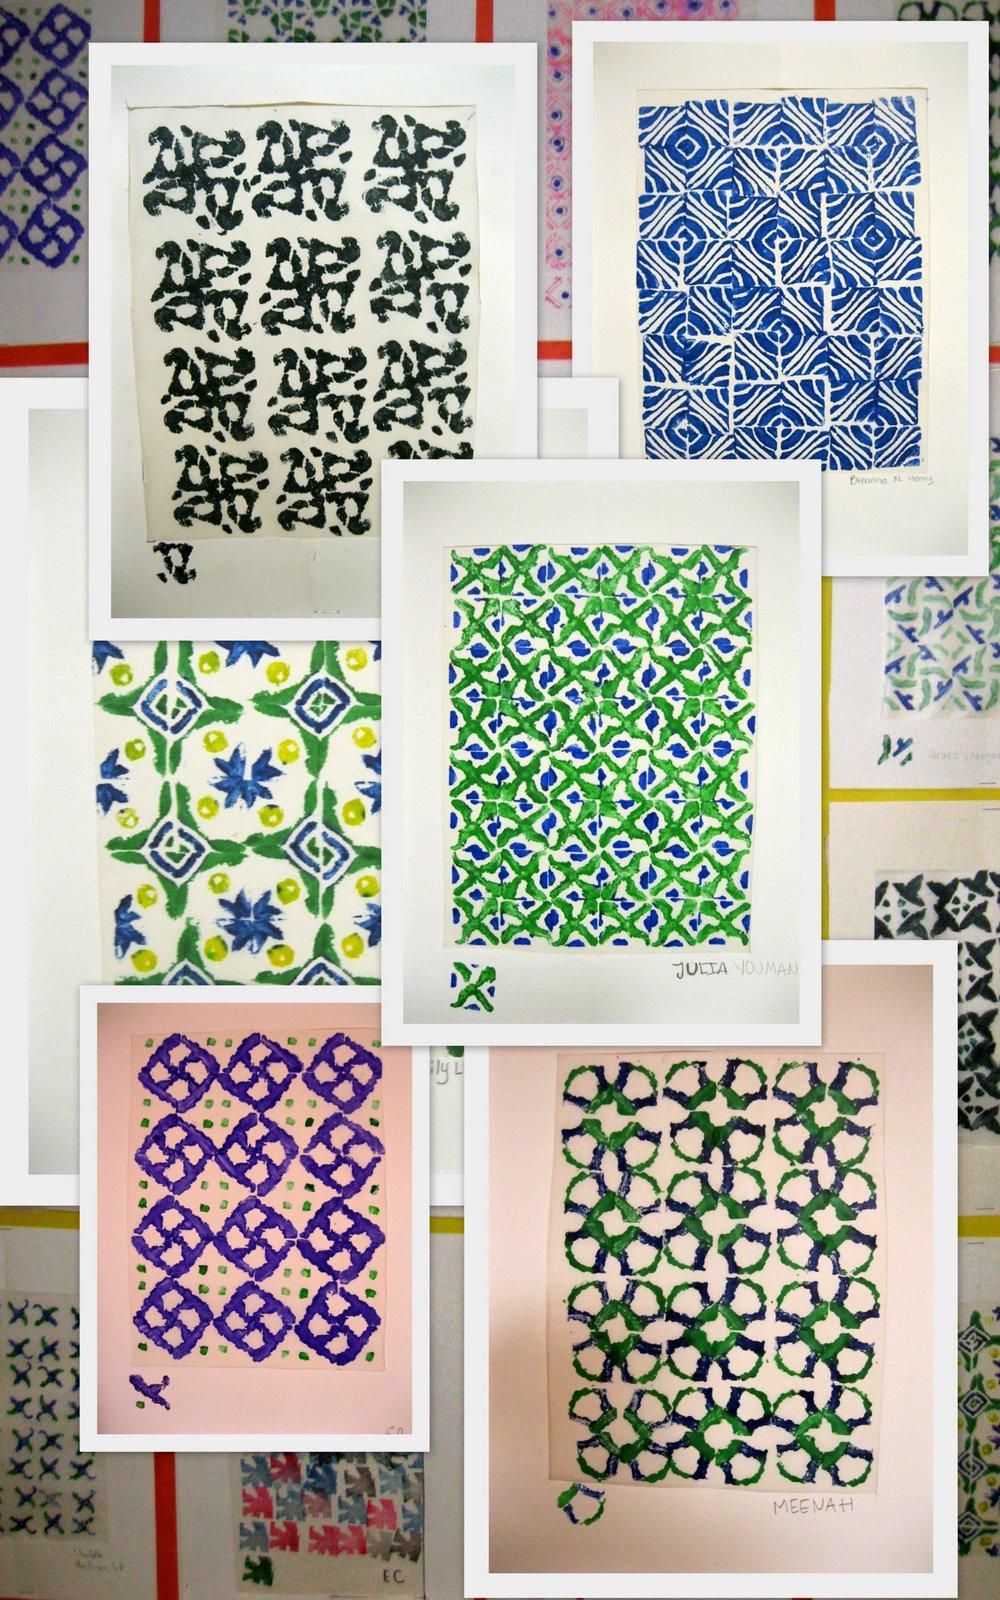 The Art Room 5th Grade Eraser Prints